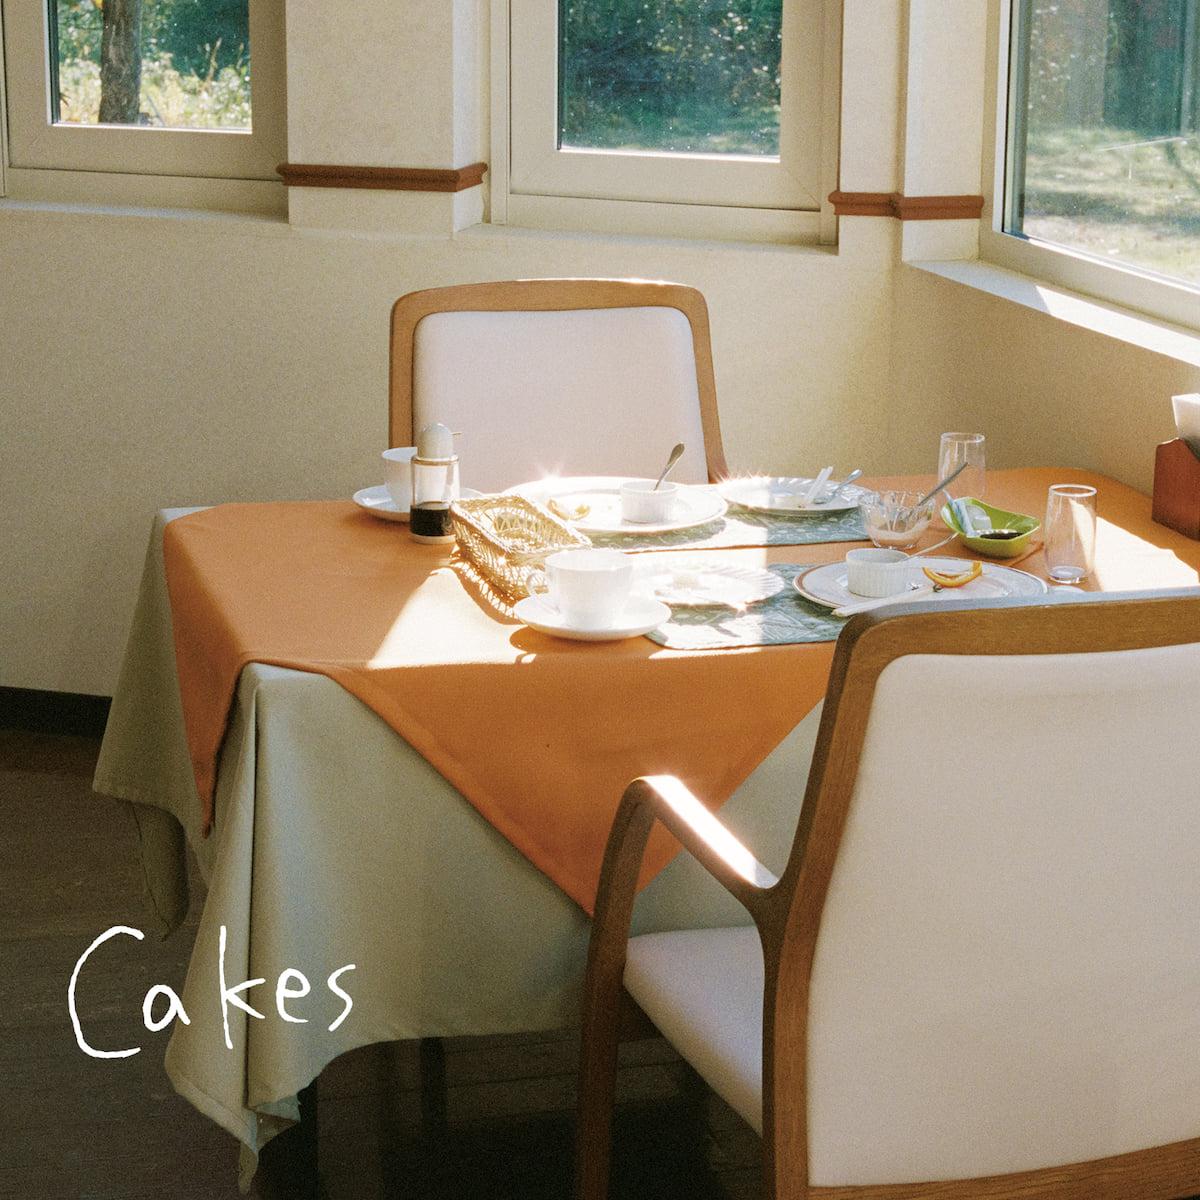 Homecomings、4月17日リリースのシングル『Cakes』のジャケット写真&新アーティスト写真を公開! music190305_homecomings_1-1200x1200